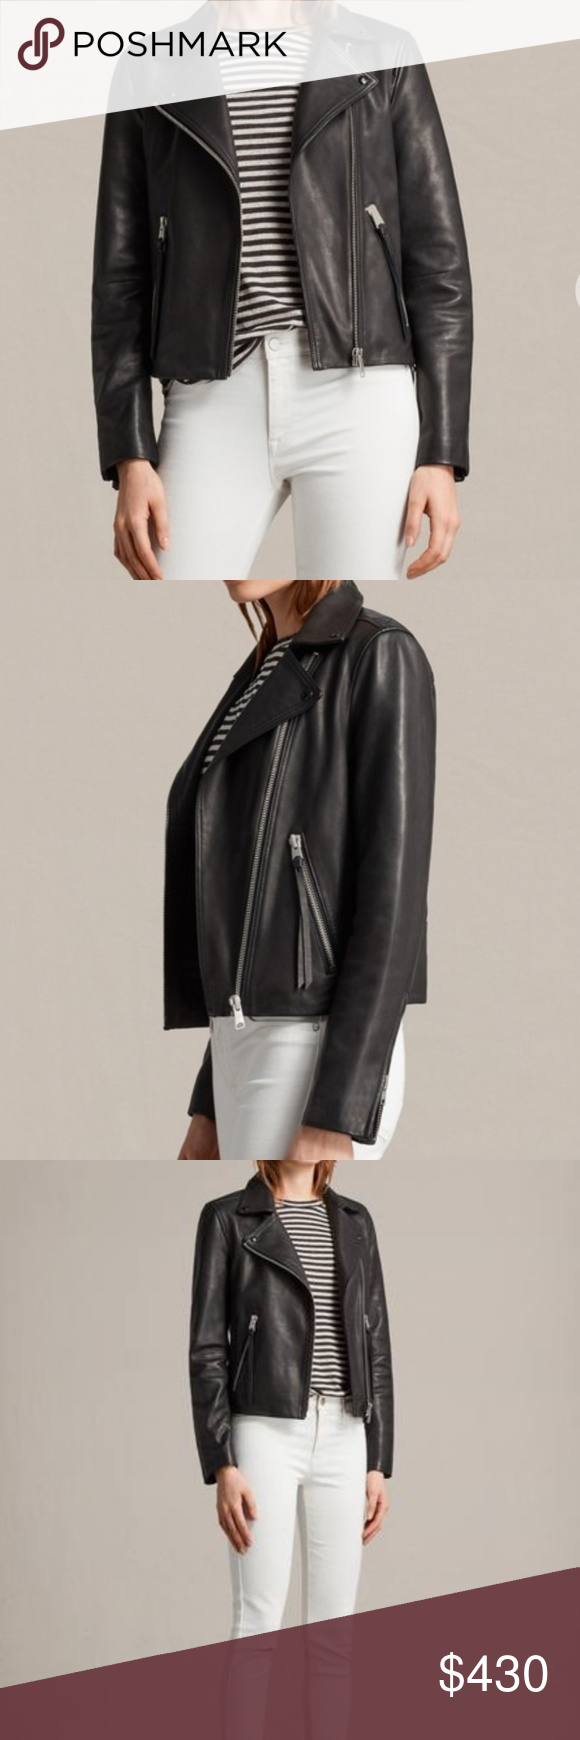 ALL SAINTS Dalby Leather Jacket, Black Black moto jacket